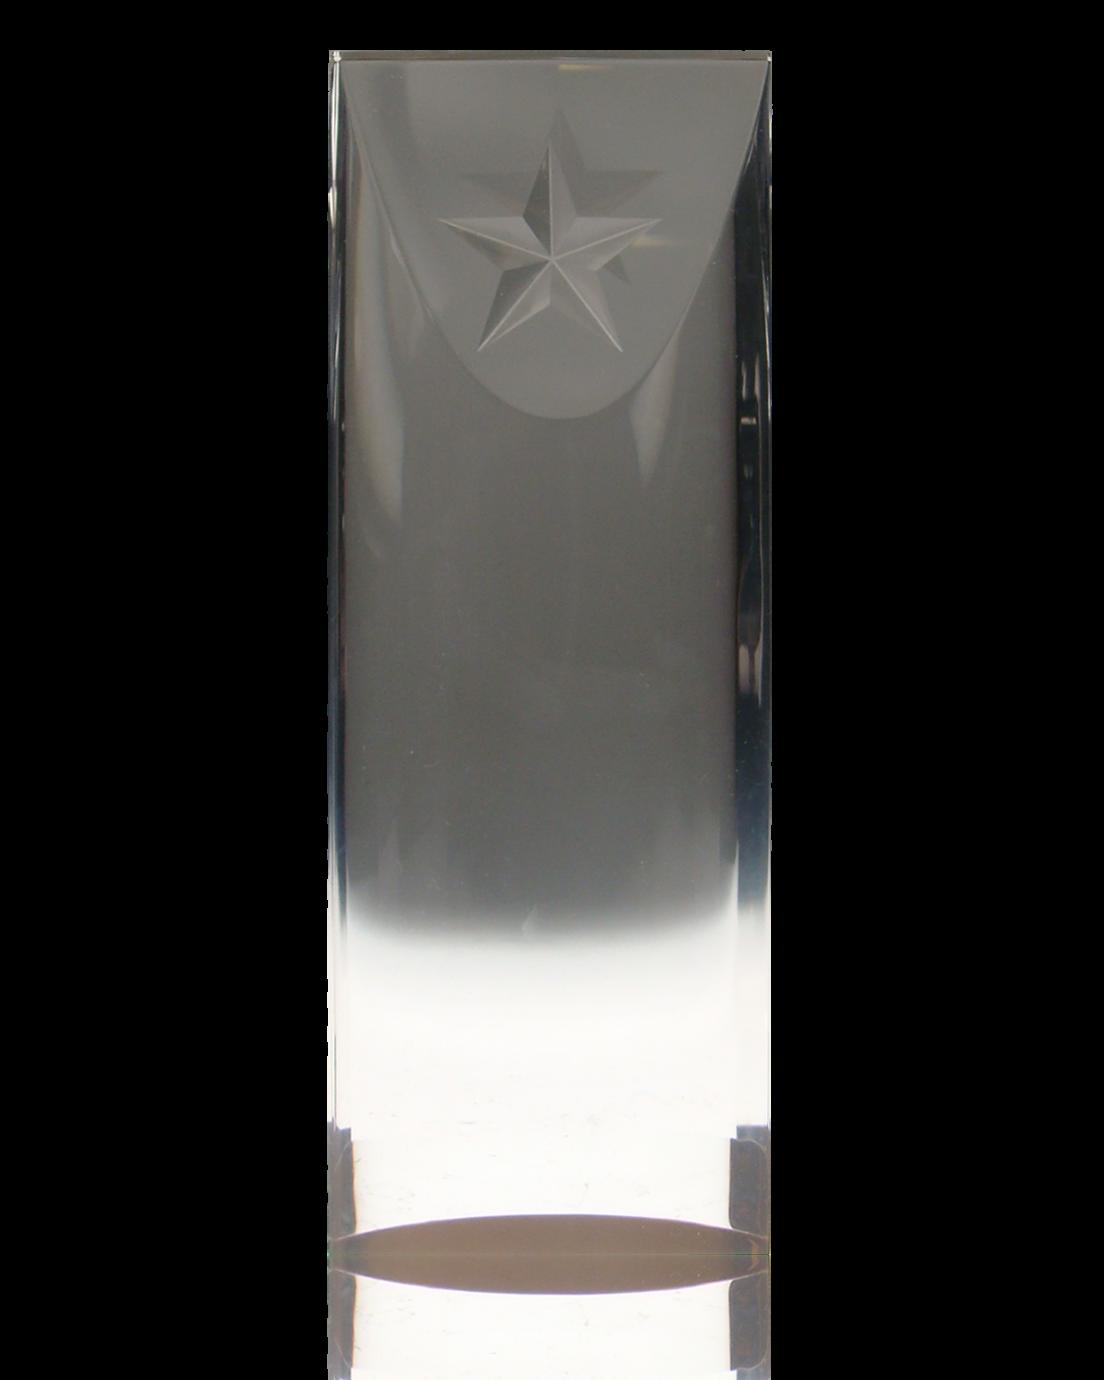 Acrylic Slice with Star